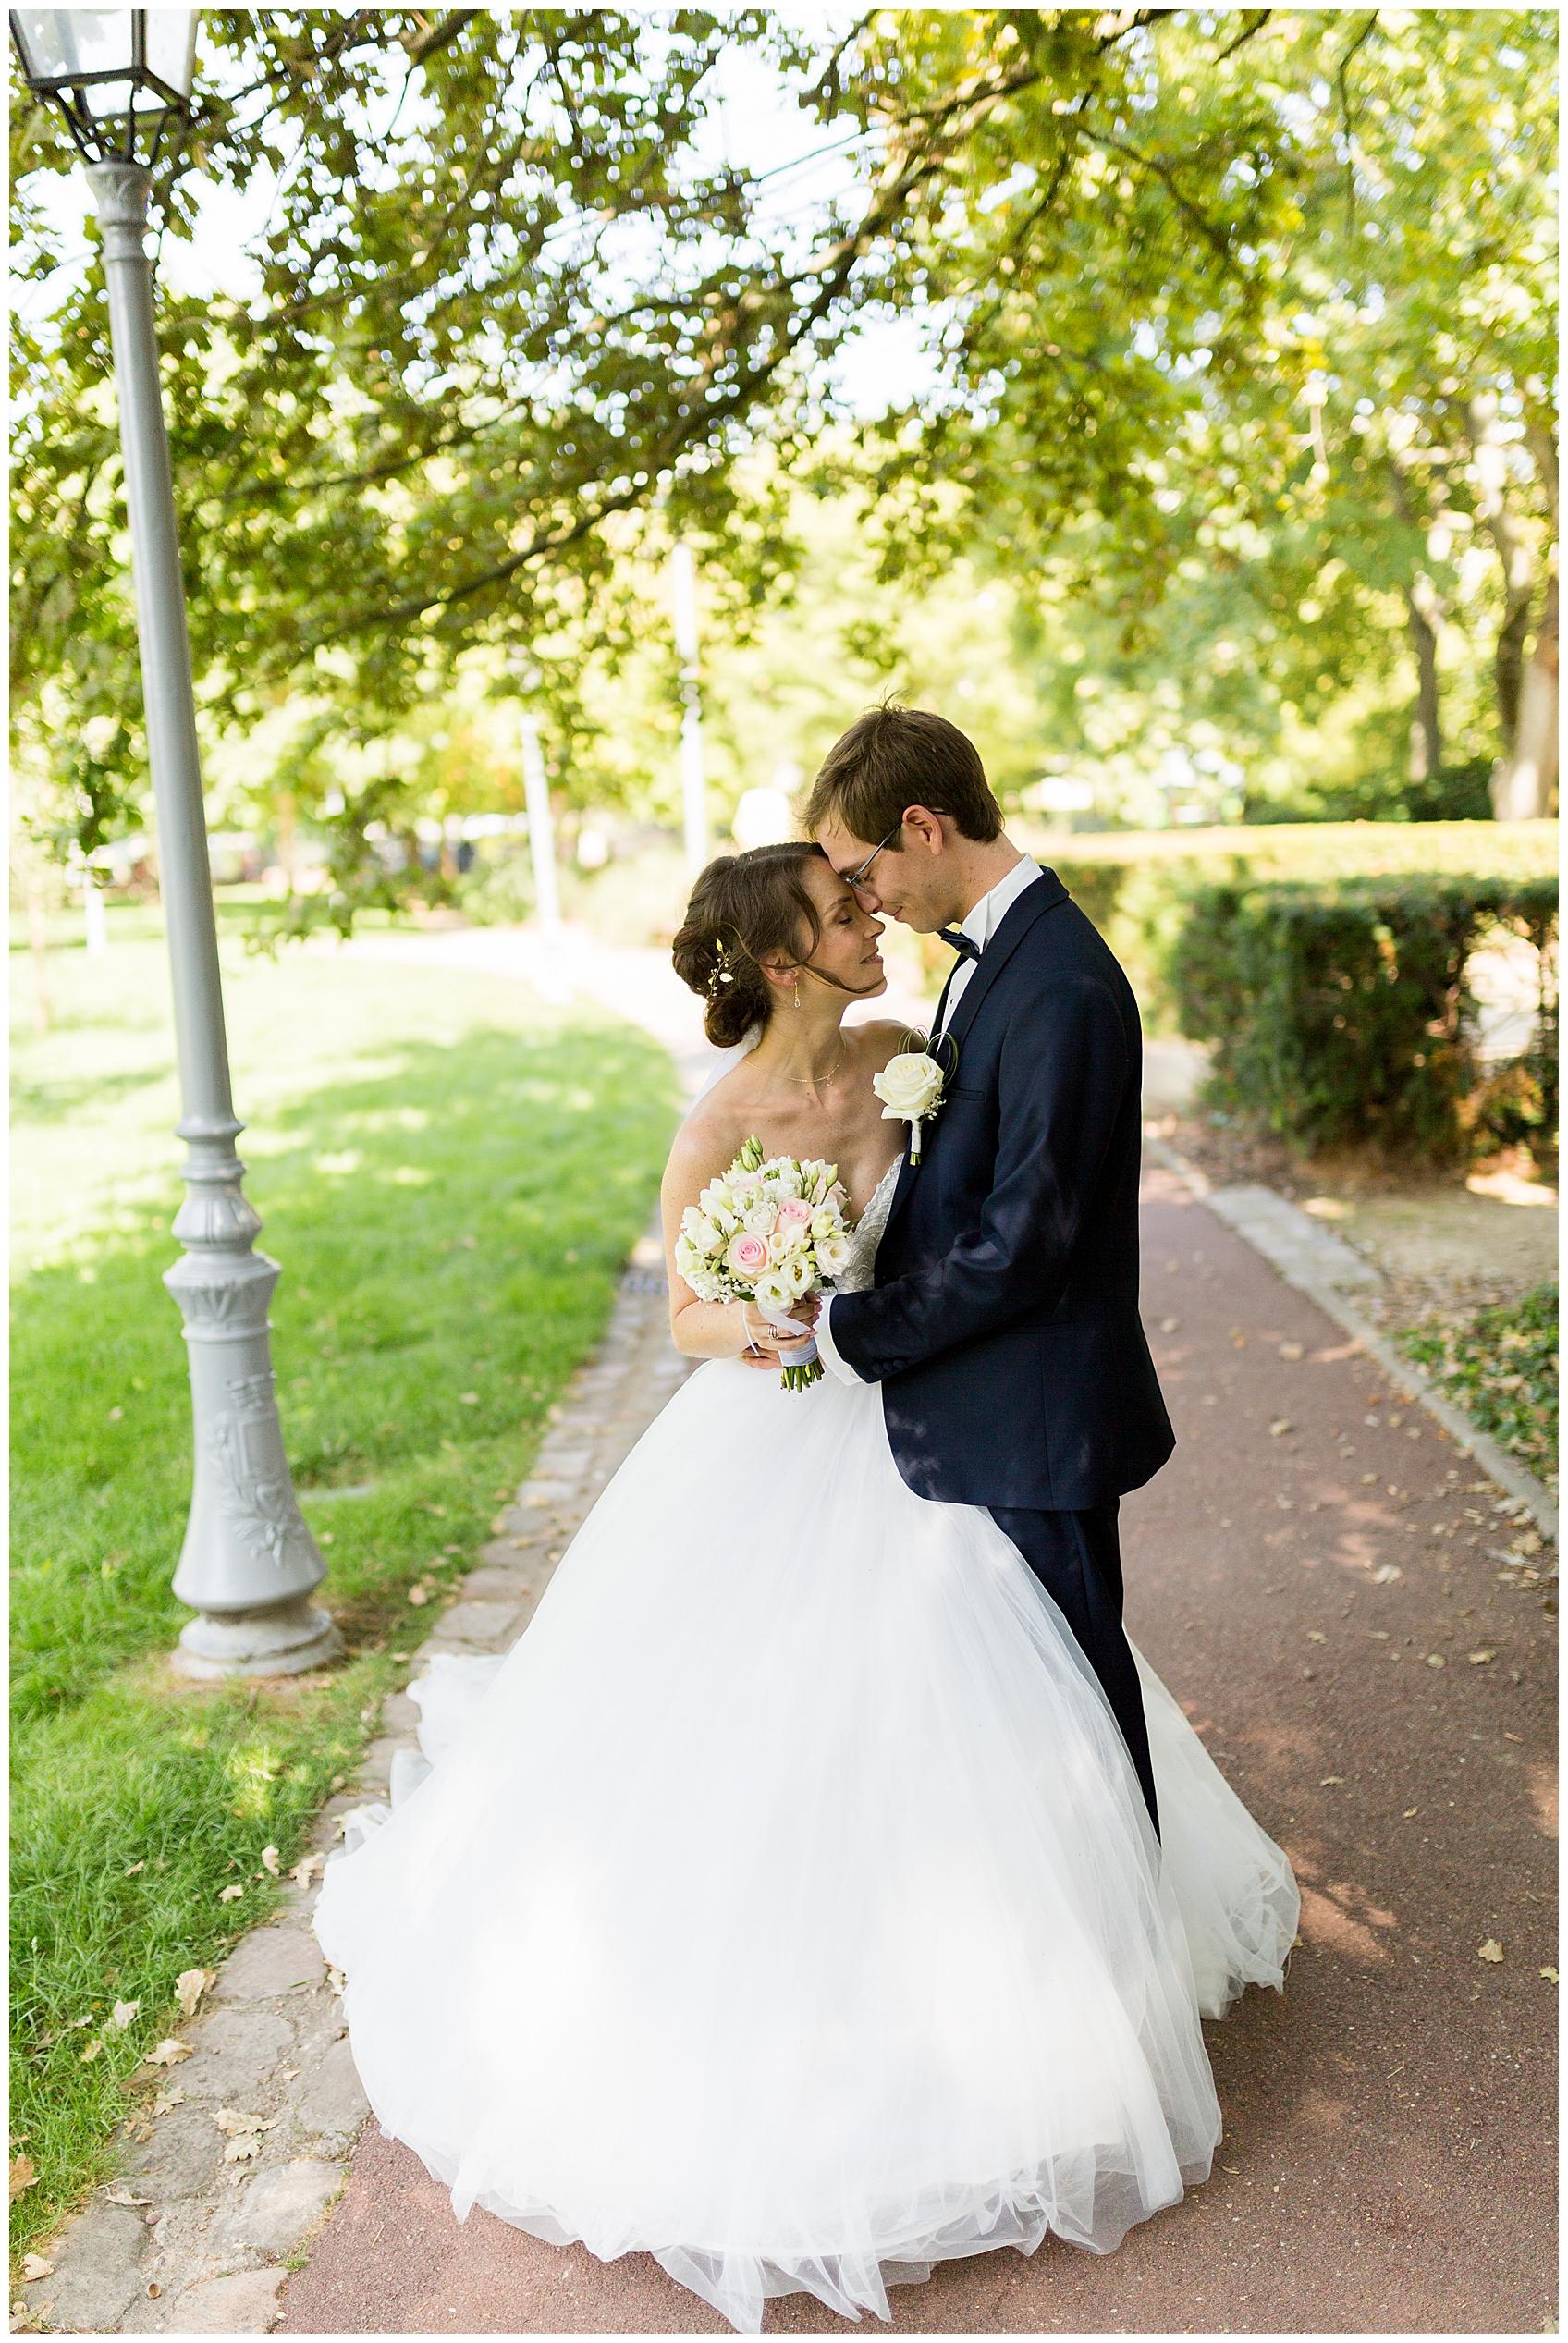 Elodie Régniez Photographe mariage Troyes